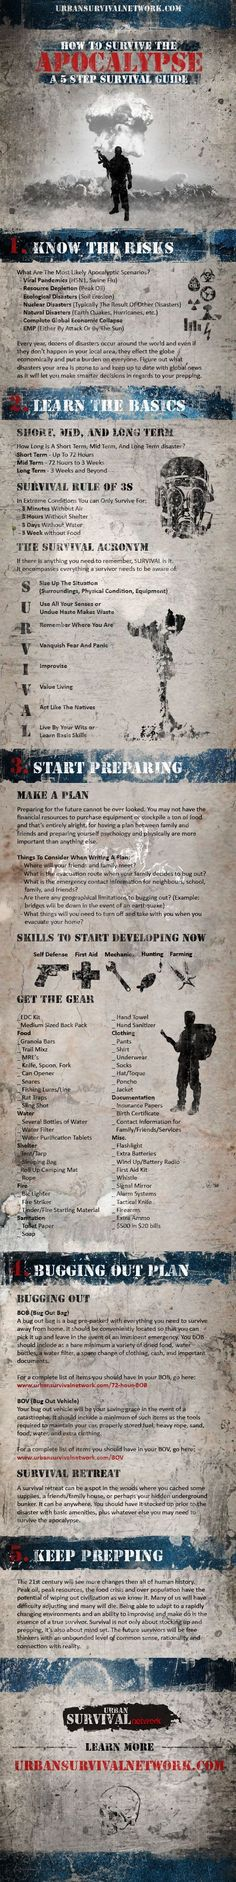 How to Survive the Apocalypse | survivalist ultimate guide. | http://survivallife.com/2014/03/03/survival-infographics/